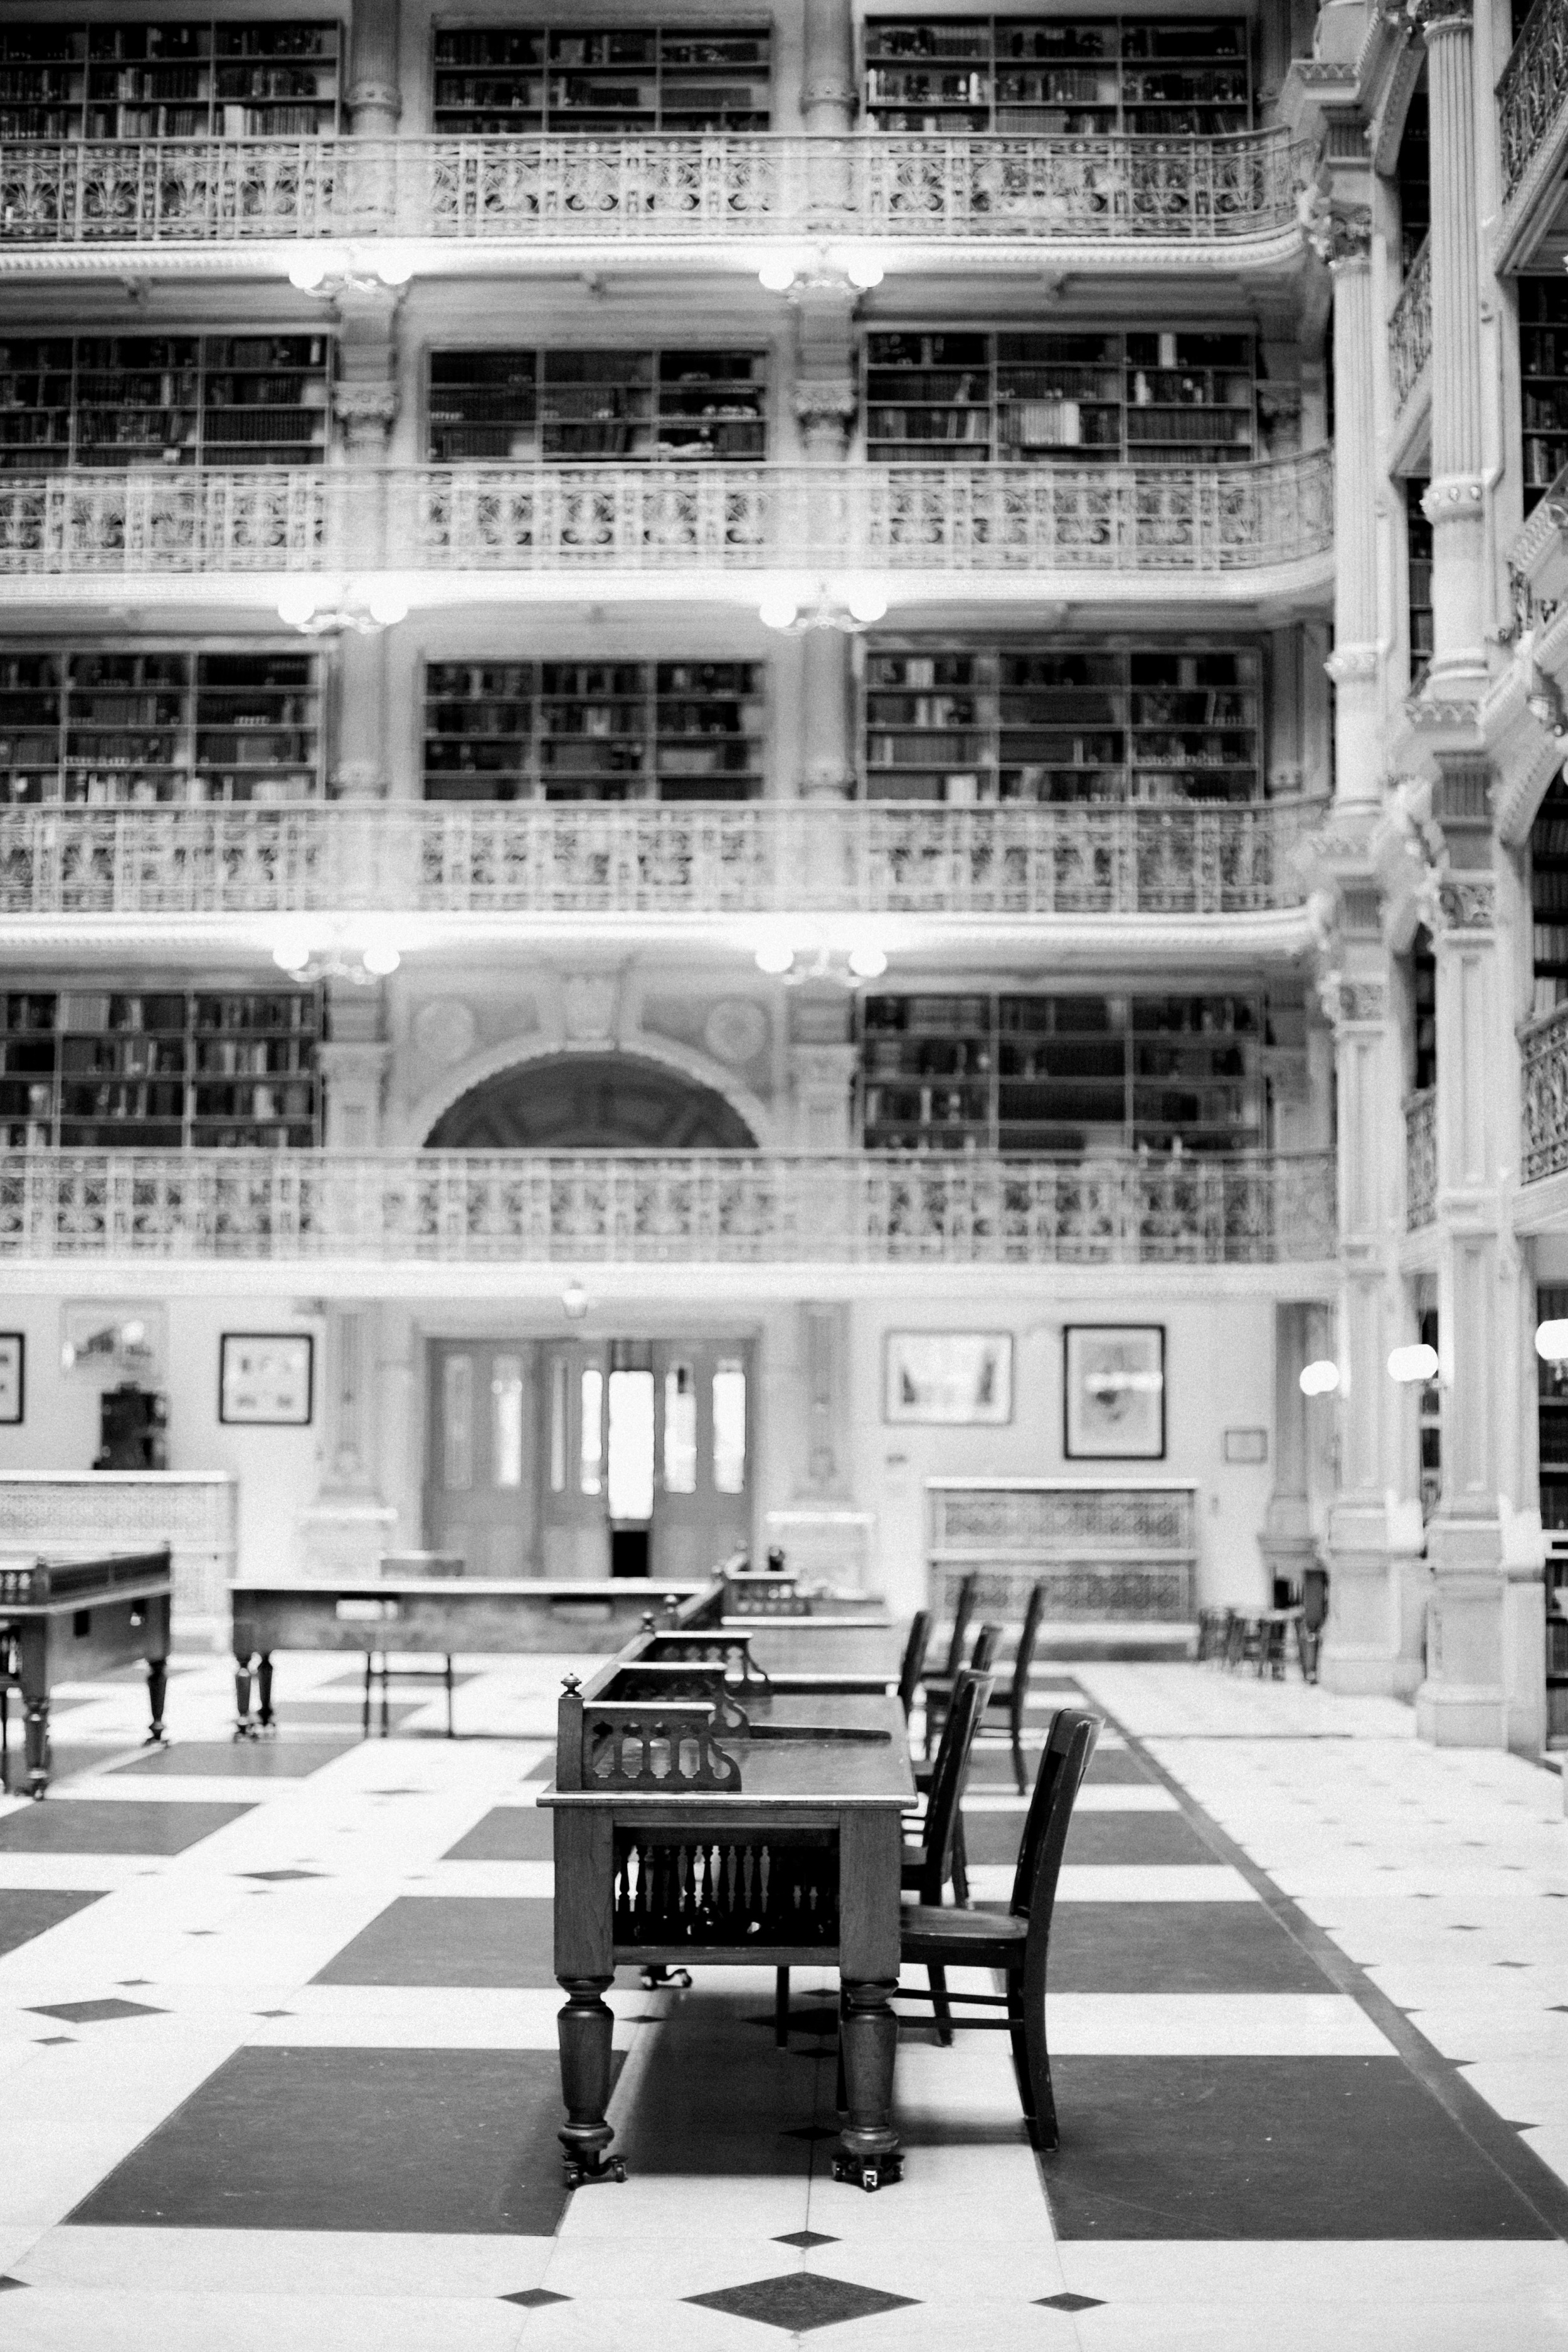 Peabody_Library_010.jpg